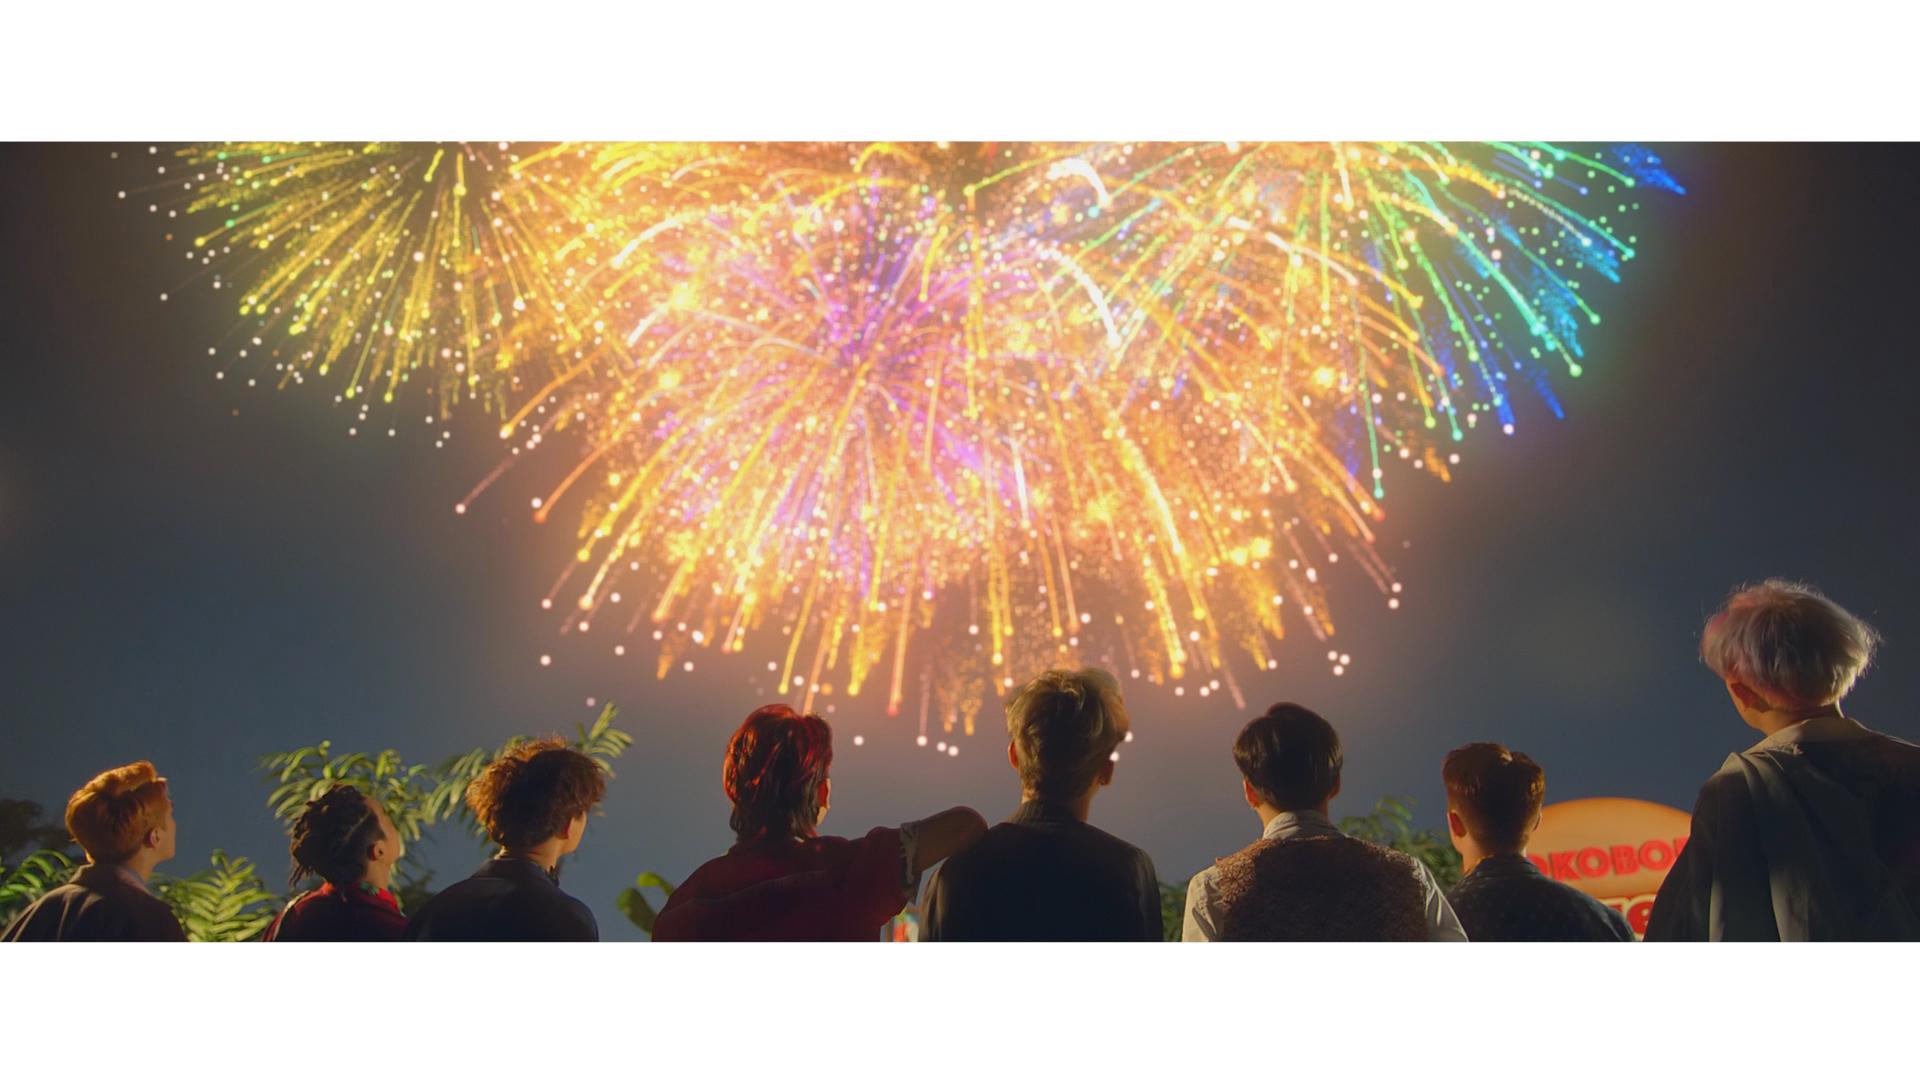 EXO_叩叩趴(Ko Ko Bop)_Music Video Teaser